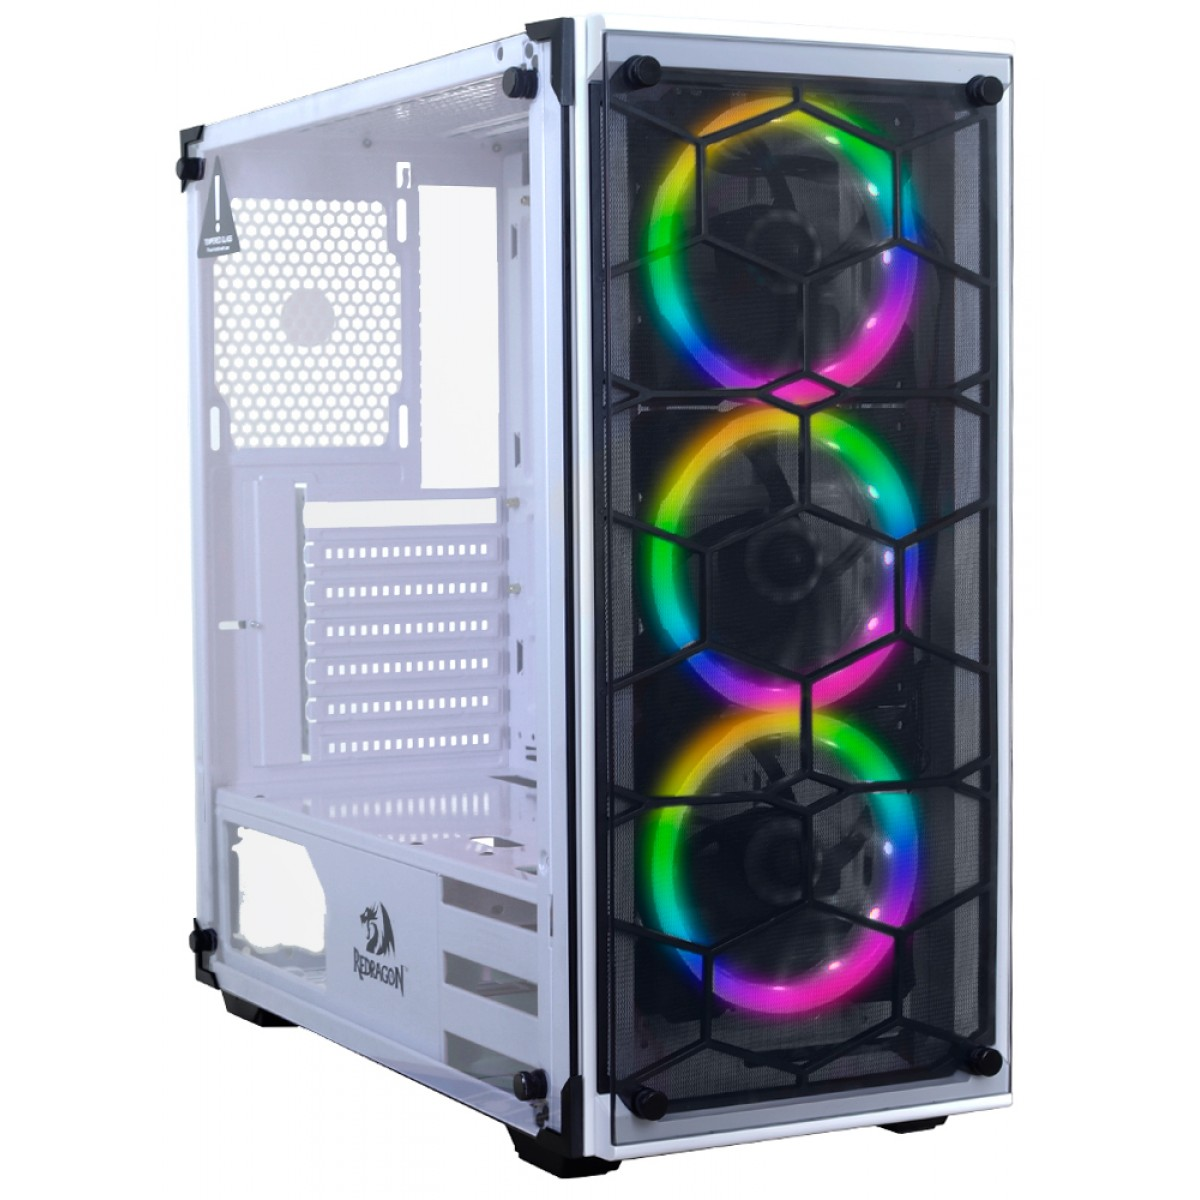 Pc Gamer Tera Edition Intel i7 9700F / Geforce RTX 2060 6GB / DDR4 8GB / HD 1TB / 600W